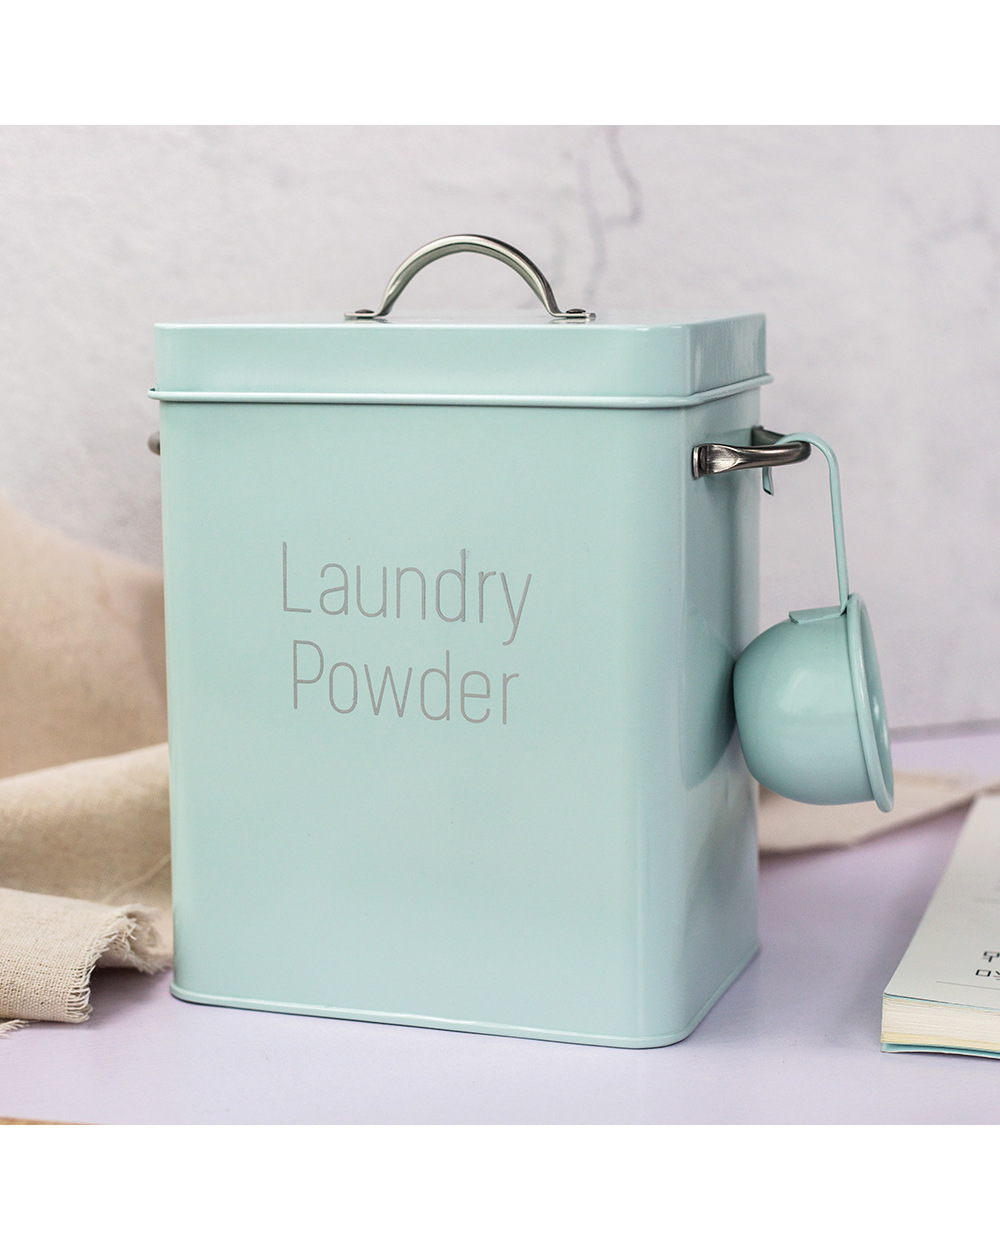 Laundry Storage Box  Laundry Powder Storage Box 1